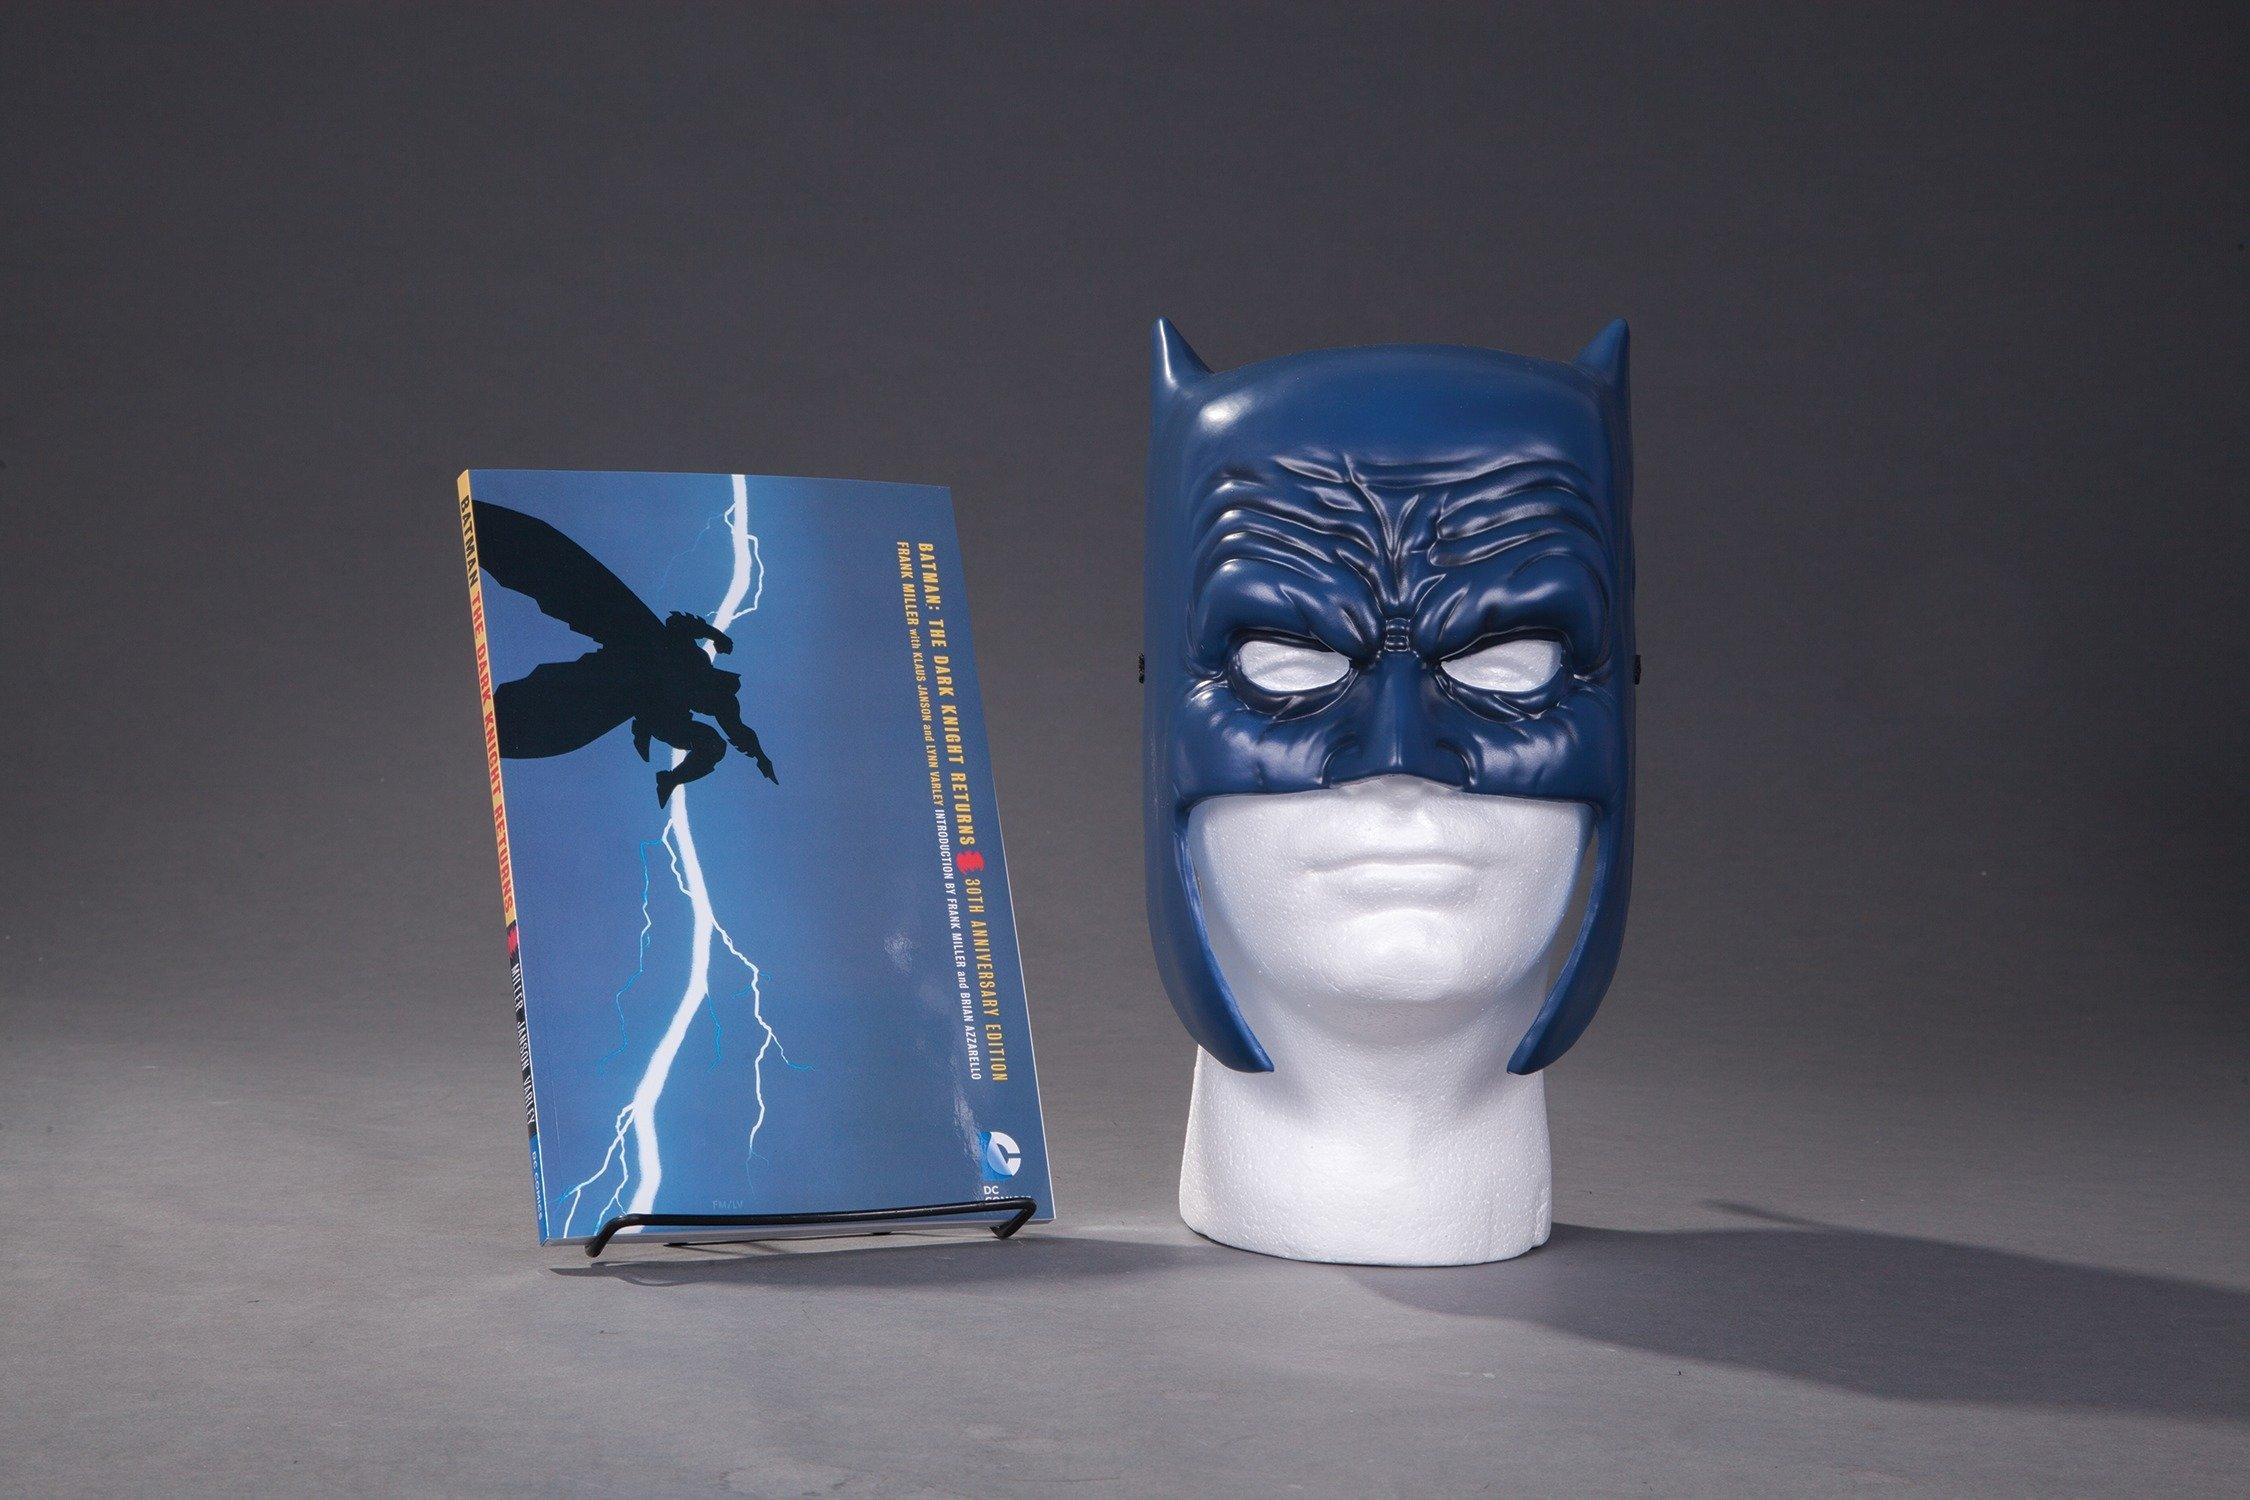 4 x HARDCOVERS Hardbacks BATMAN DARK KNIGHT RETURNS COLLECTORS EDITION BOX SET